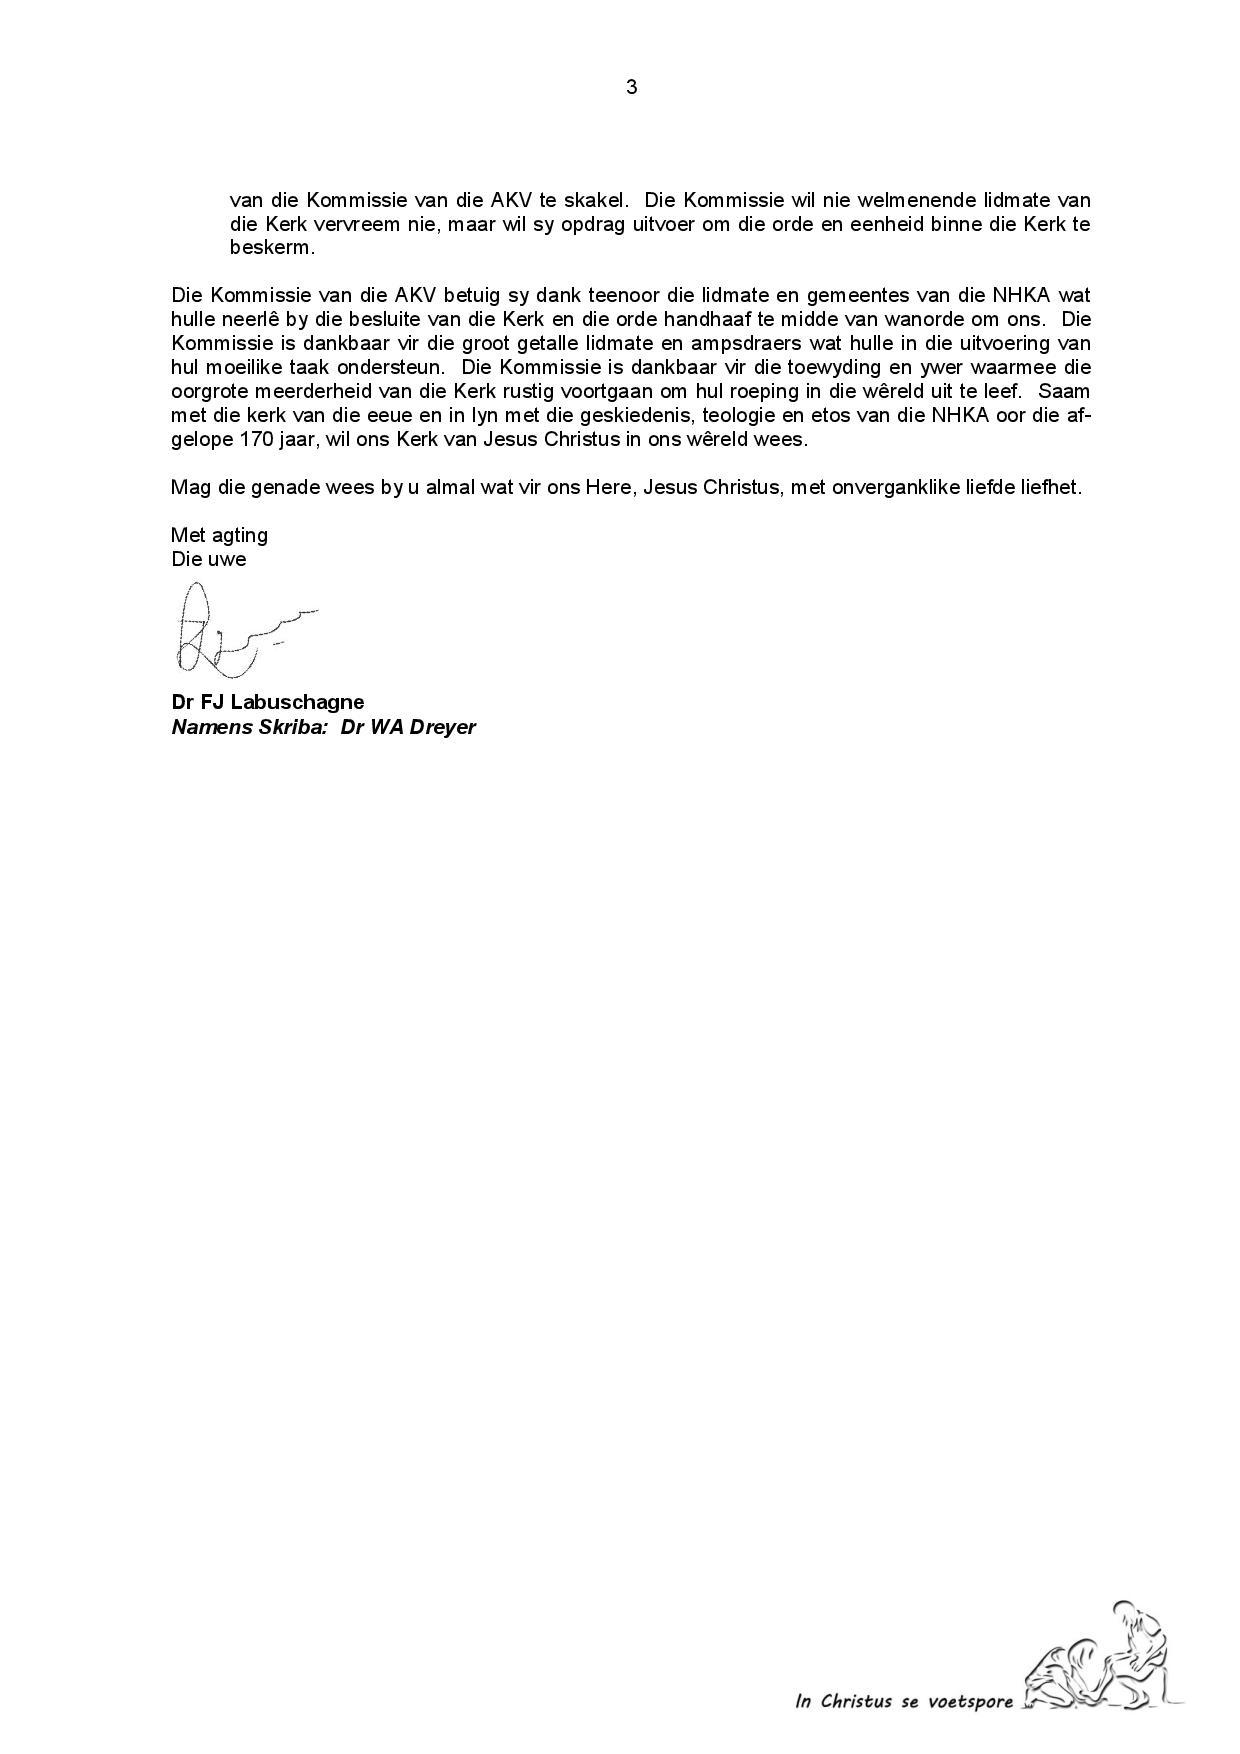 11_2013AKV_Verklaring-page-003